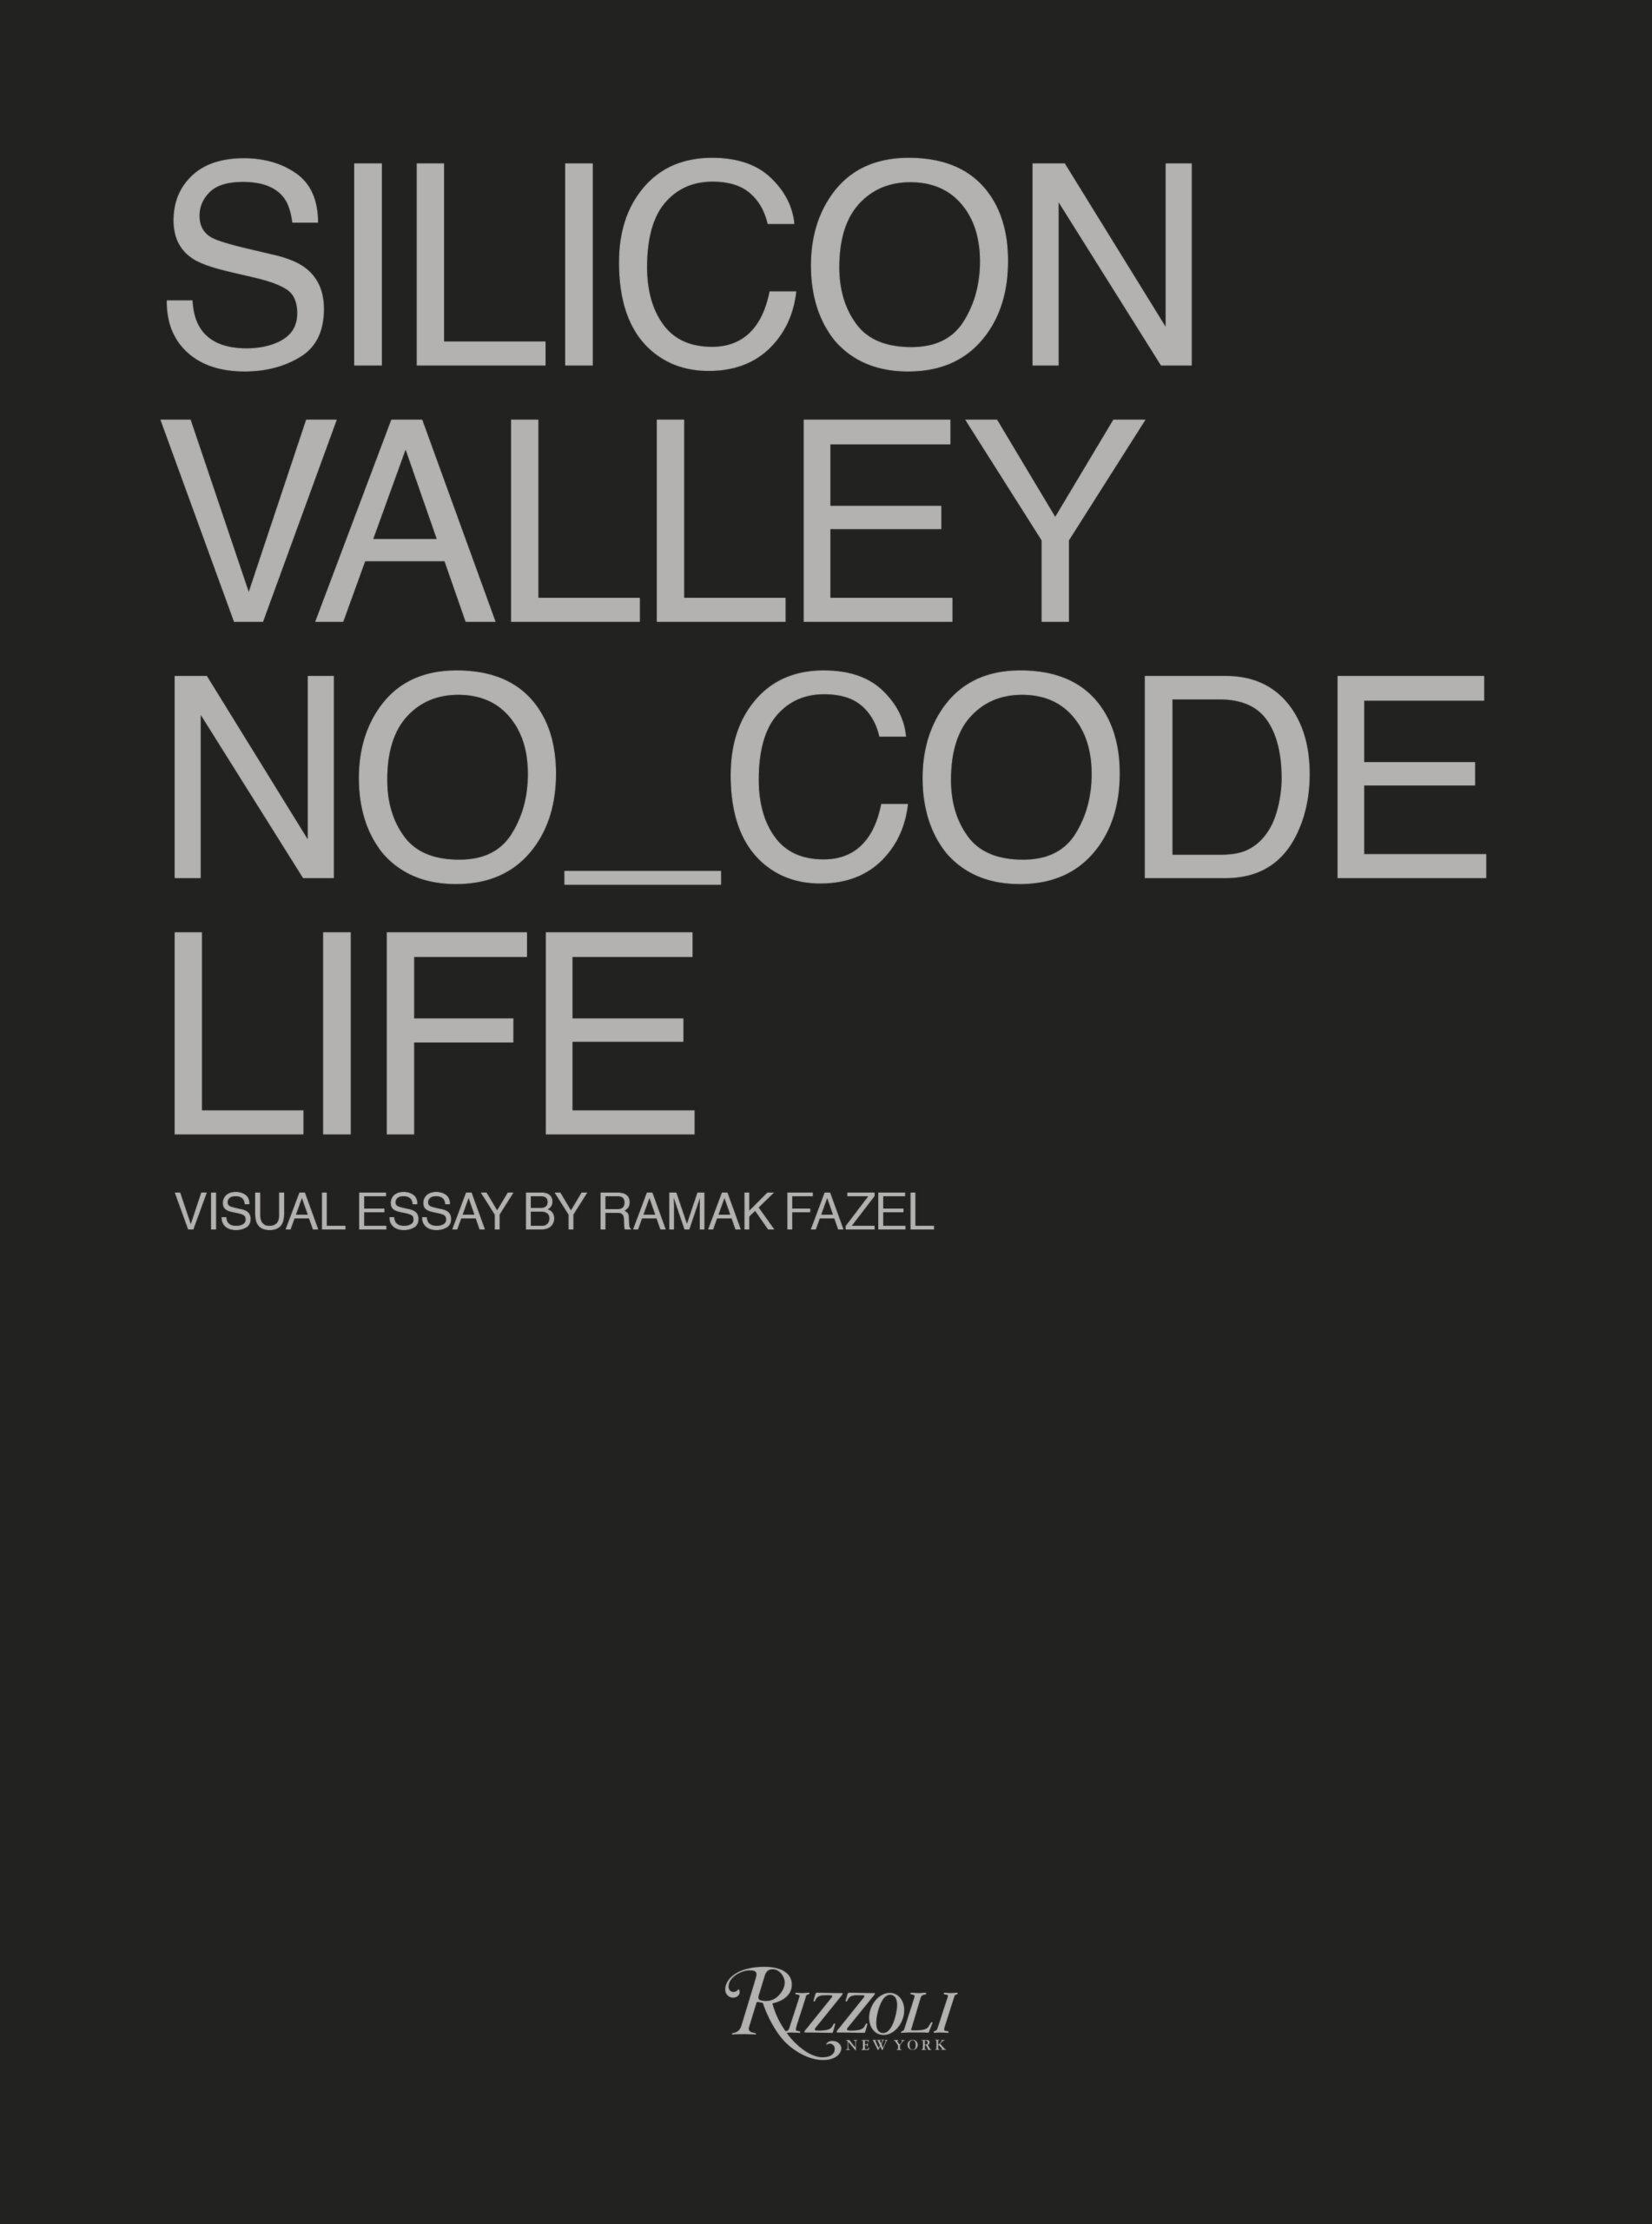 SILICON VALLEY NO_CODE LIFE, Ramak Fazel, Rizzoli